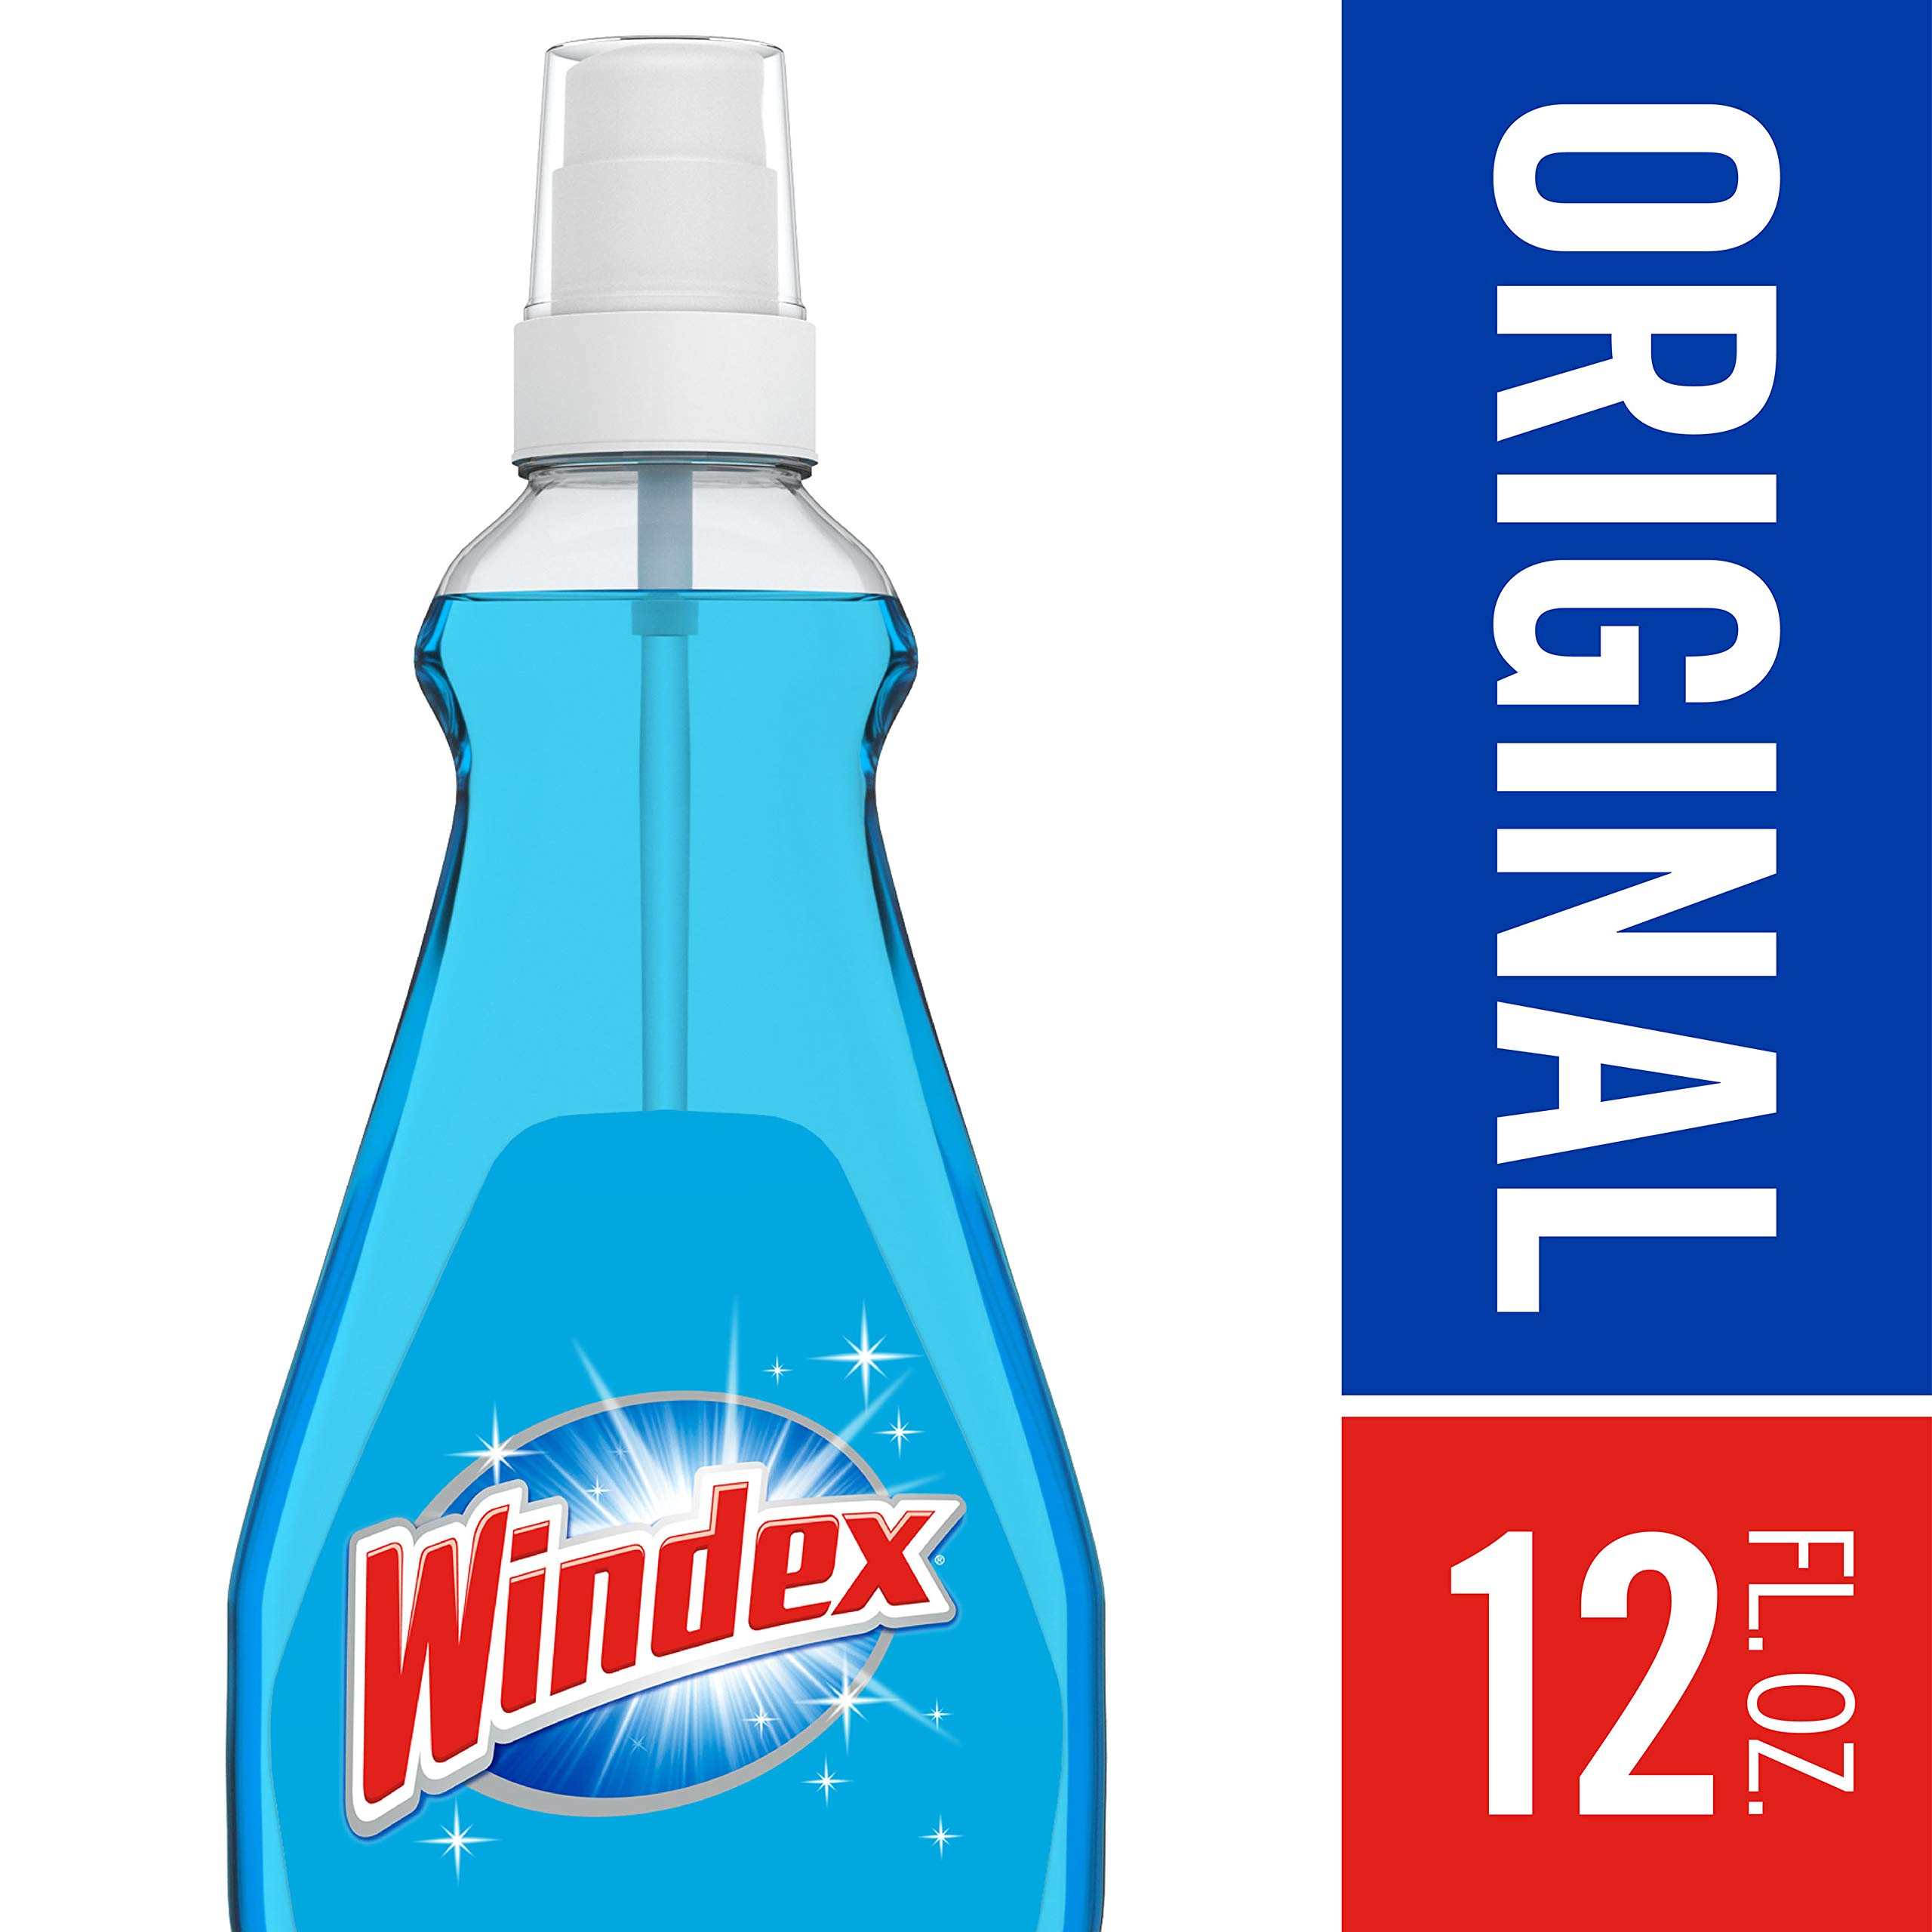 Windex Glass Cleaner with Sprayer, 12 fl oz